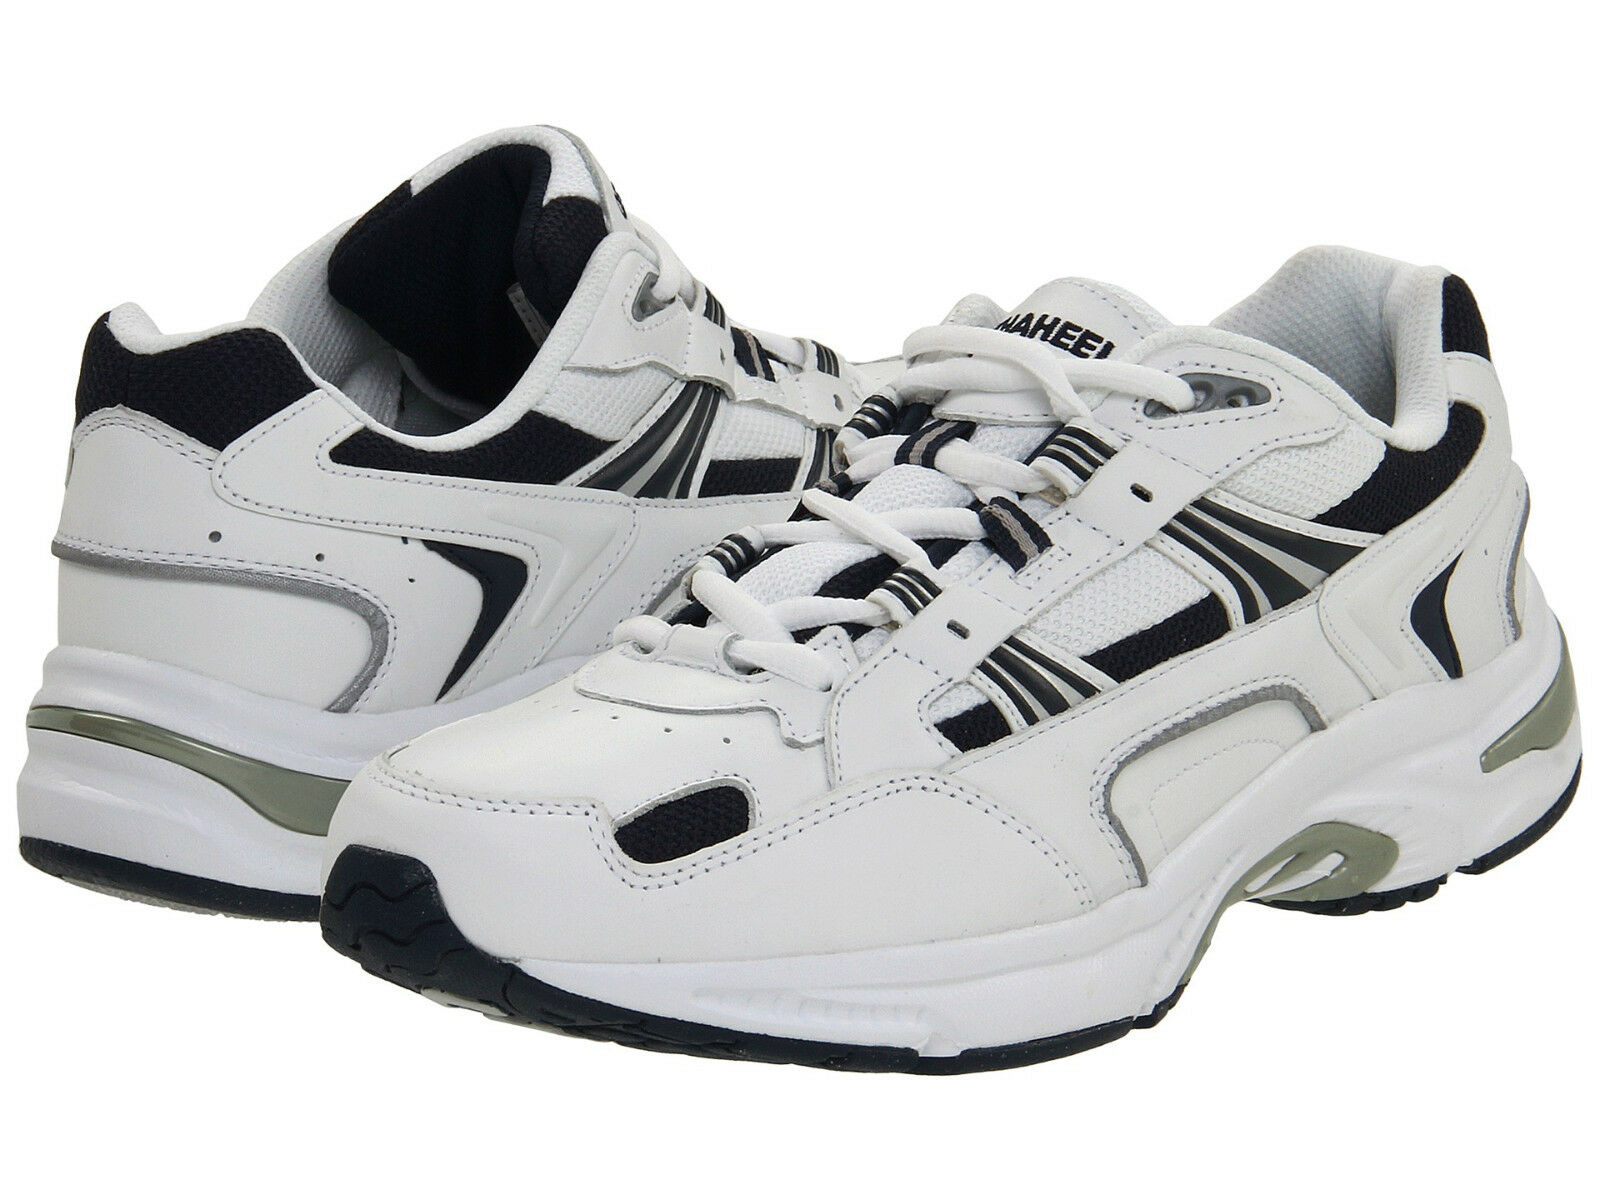 Men Vionic Orthaheel Walker 23MWALK White Navy Leather 100% Authentic Brand New